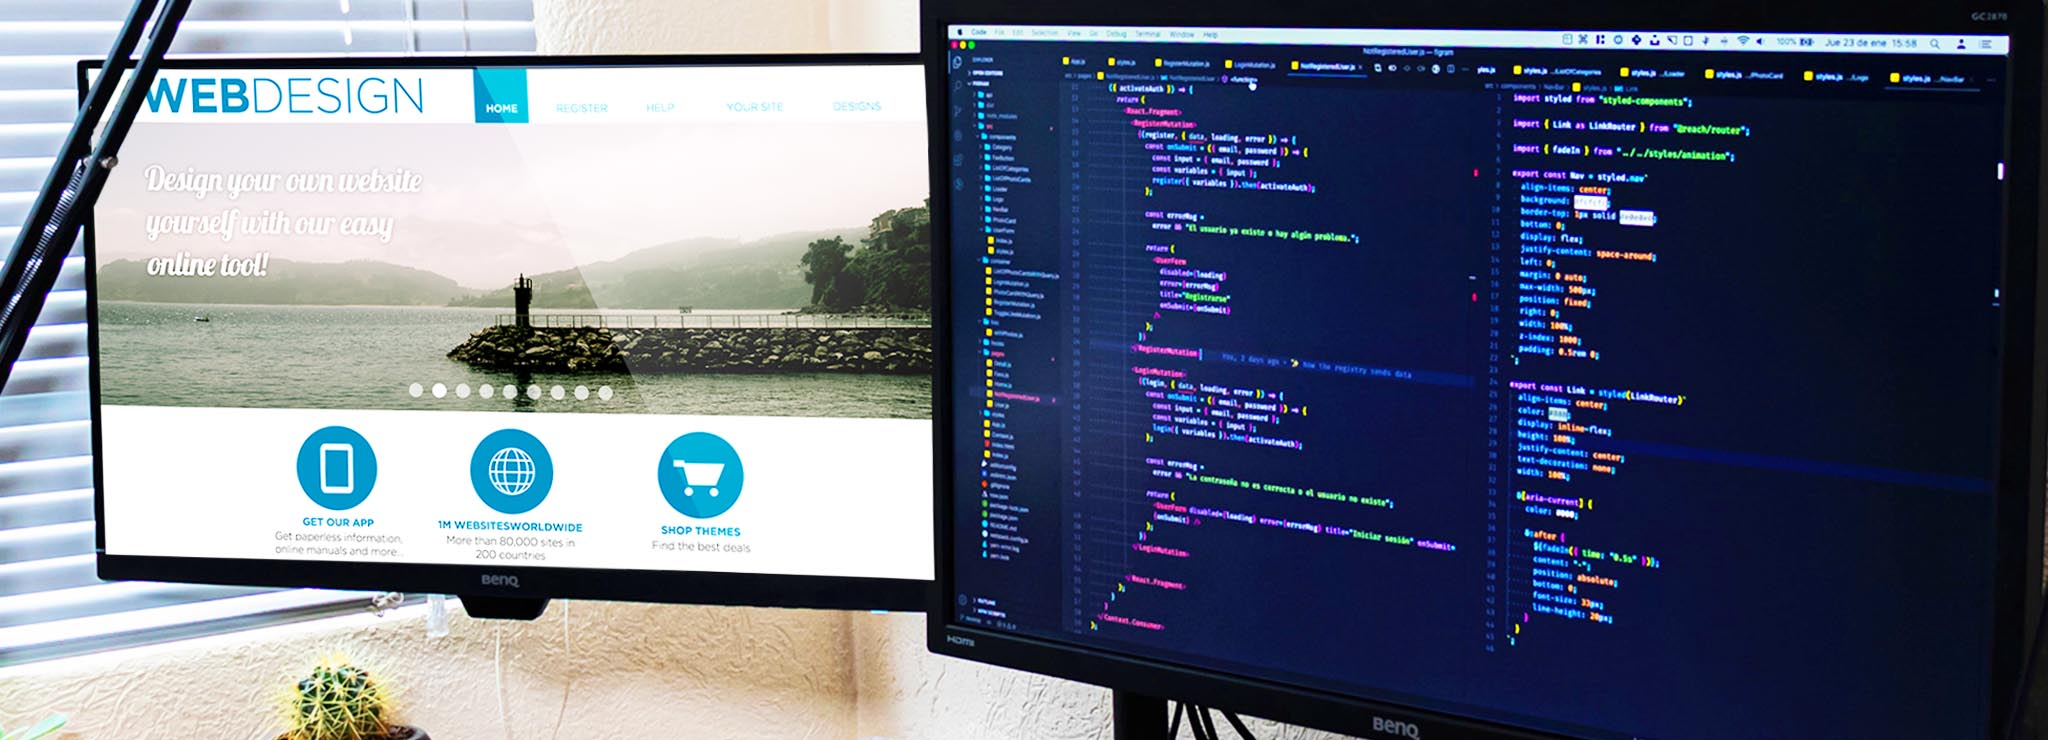 master-dis-programacion-web-uxui